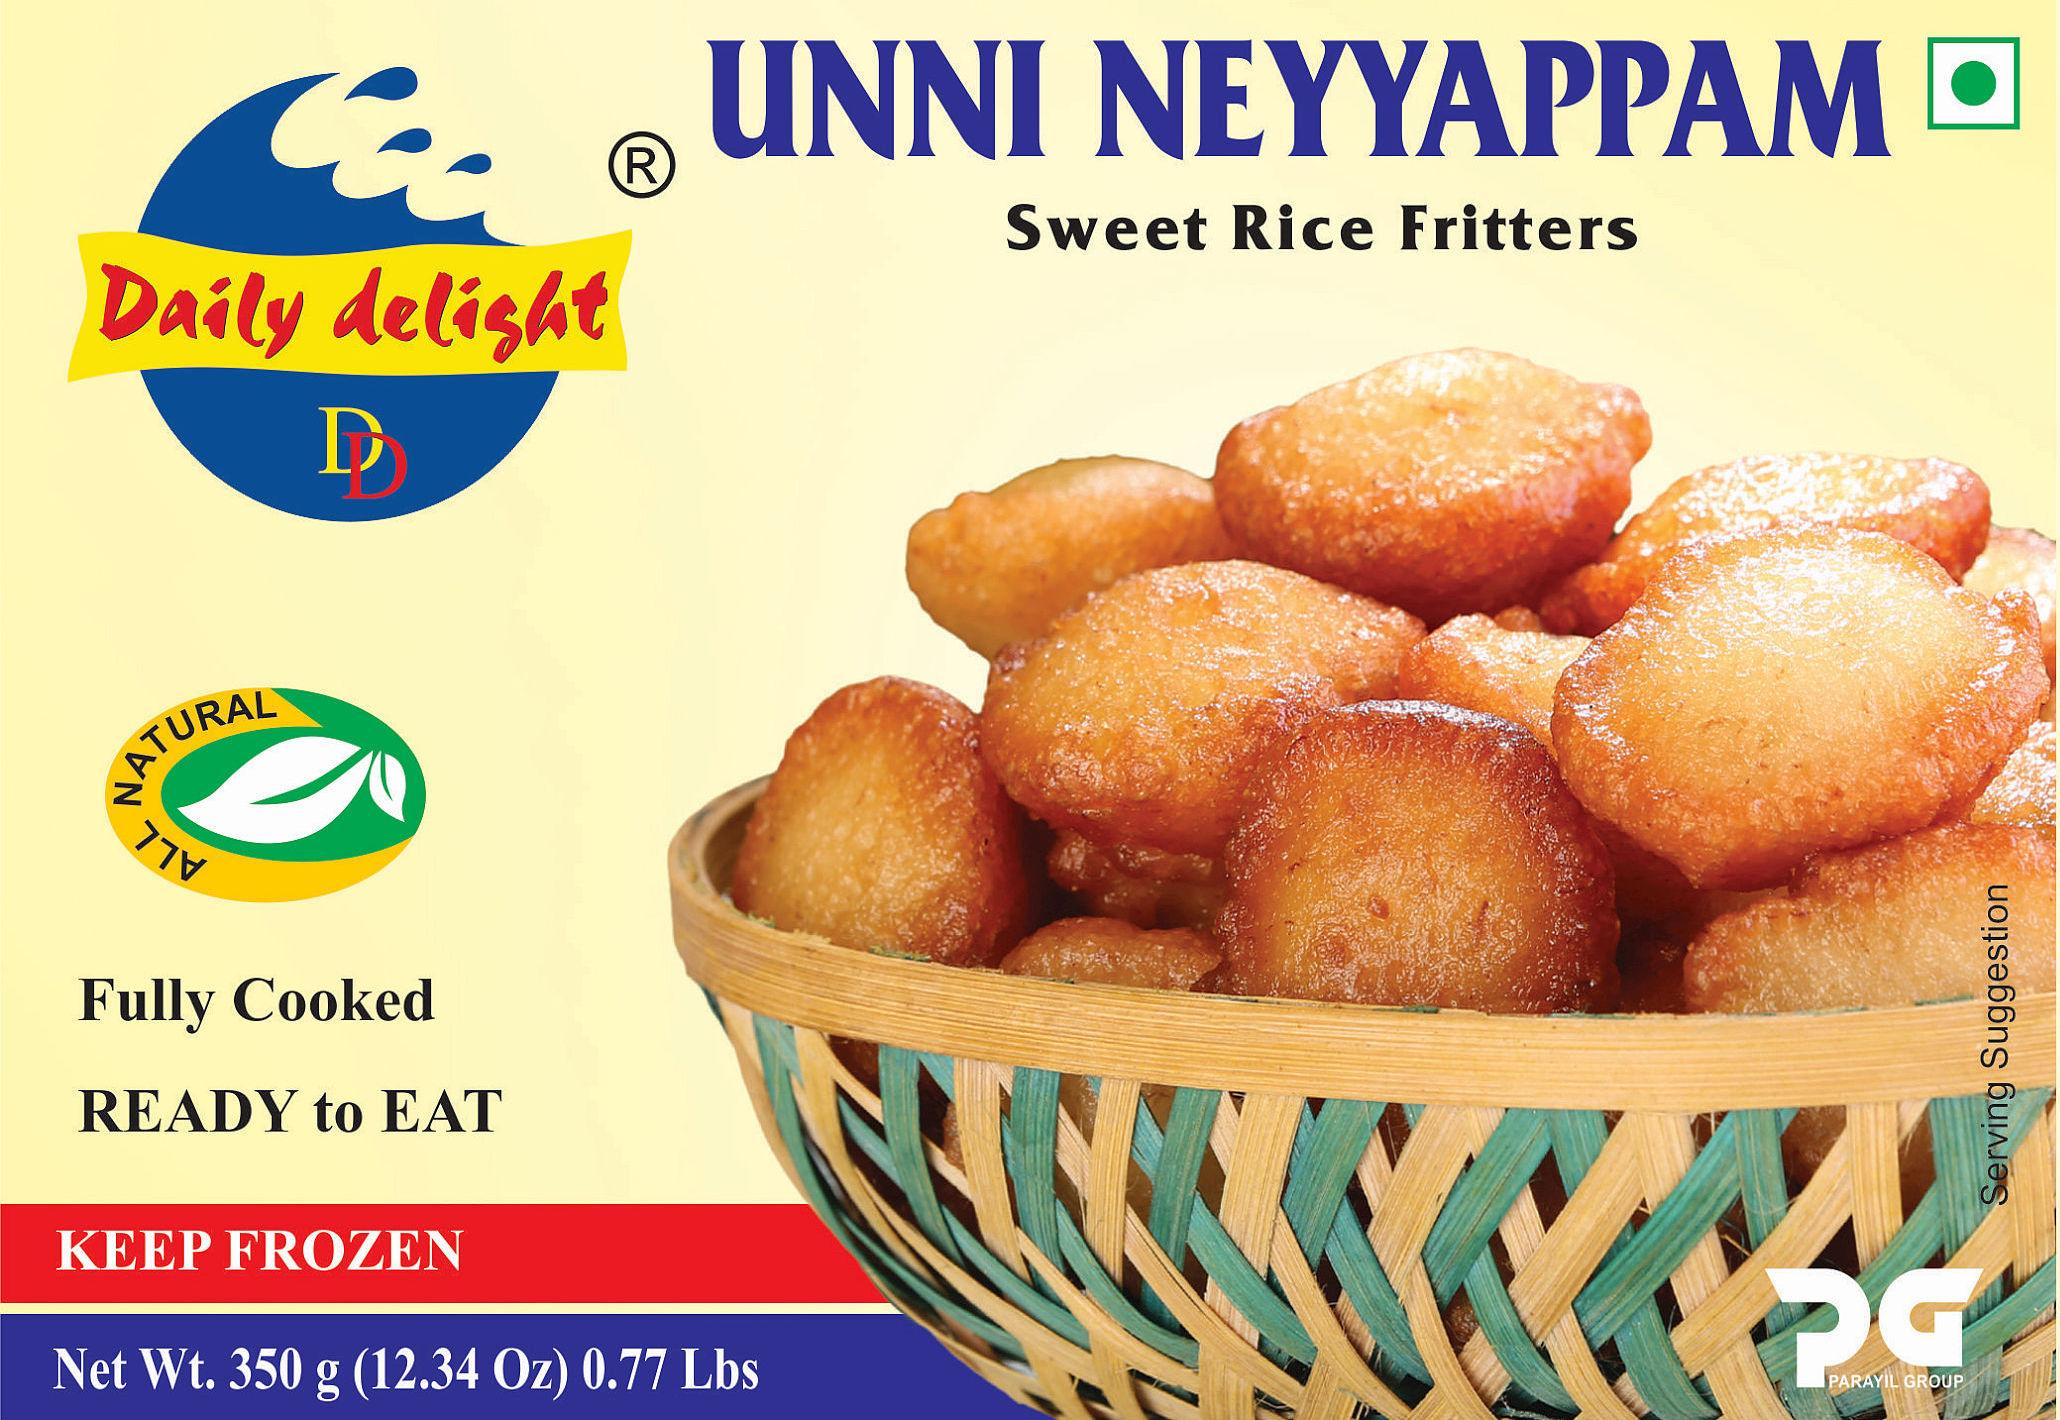 Daily Delight Unni Neyyappam